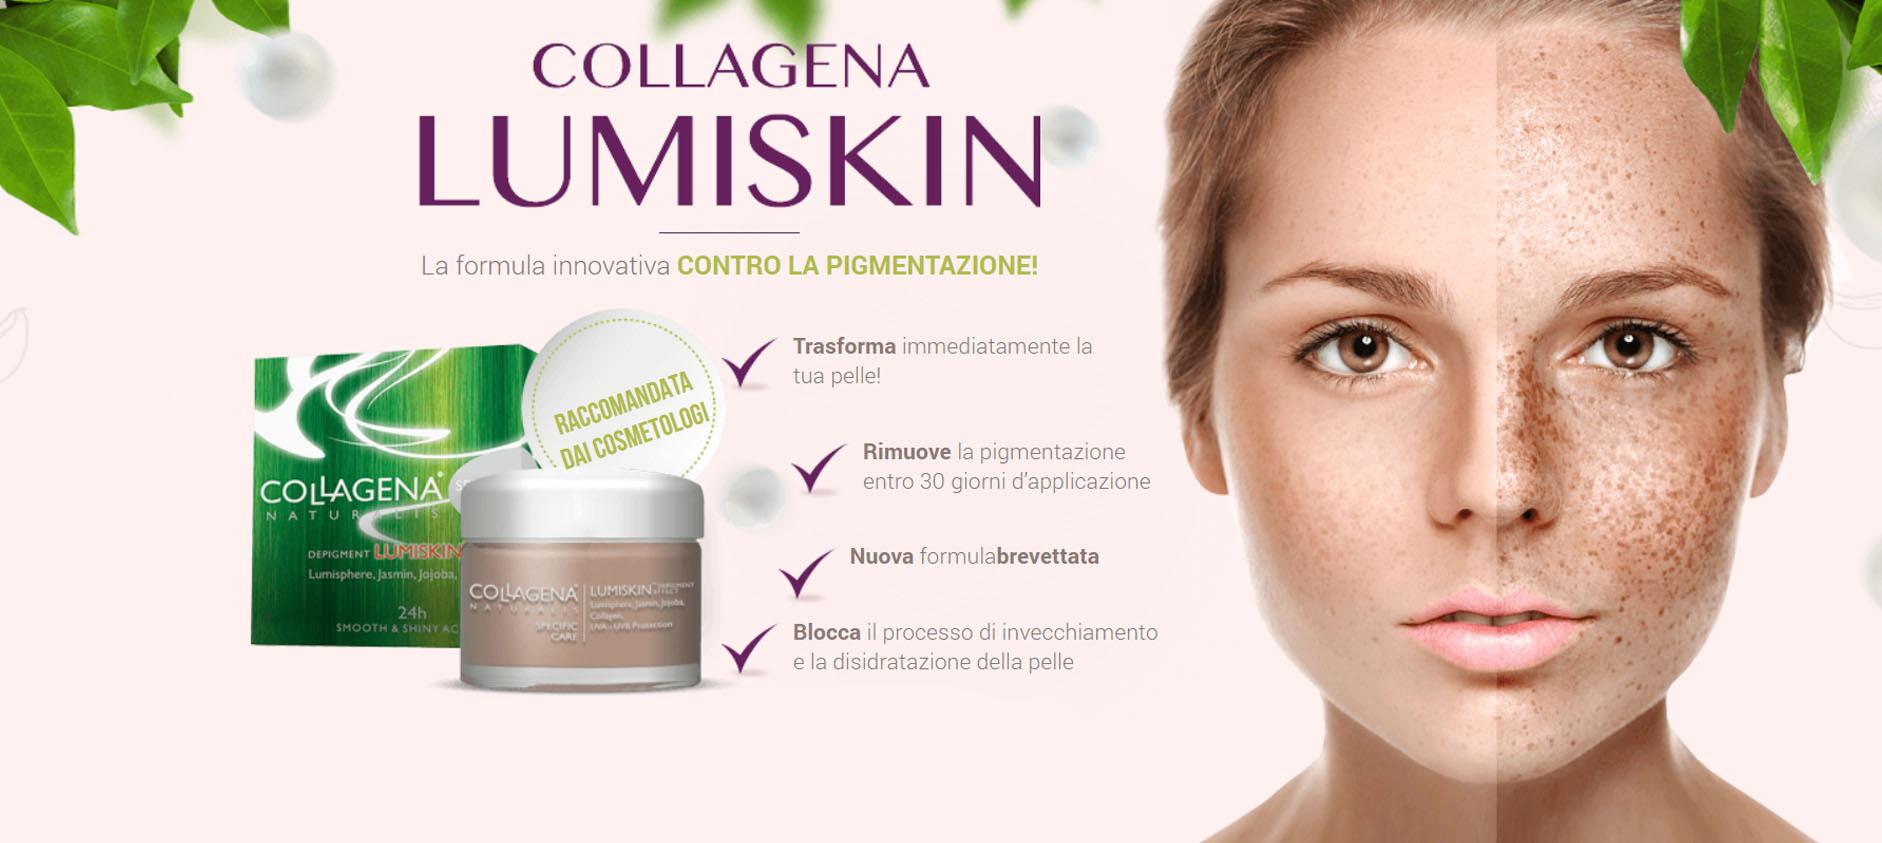 collagena lumiskin crema